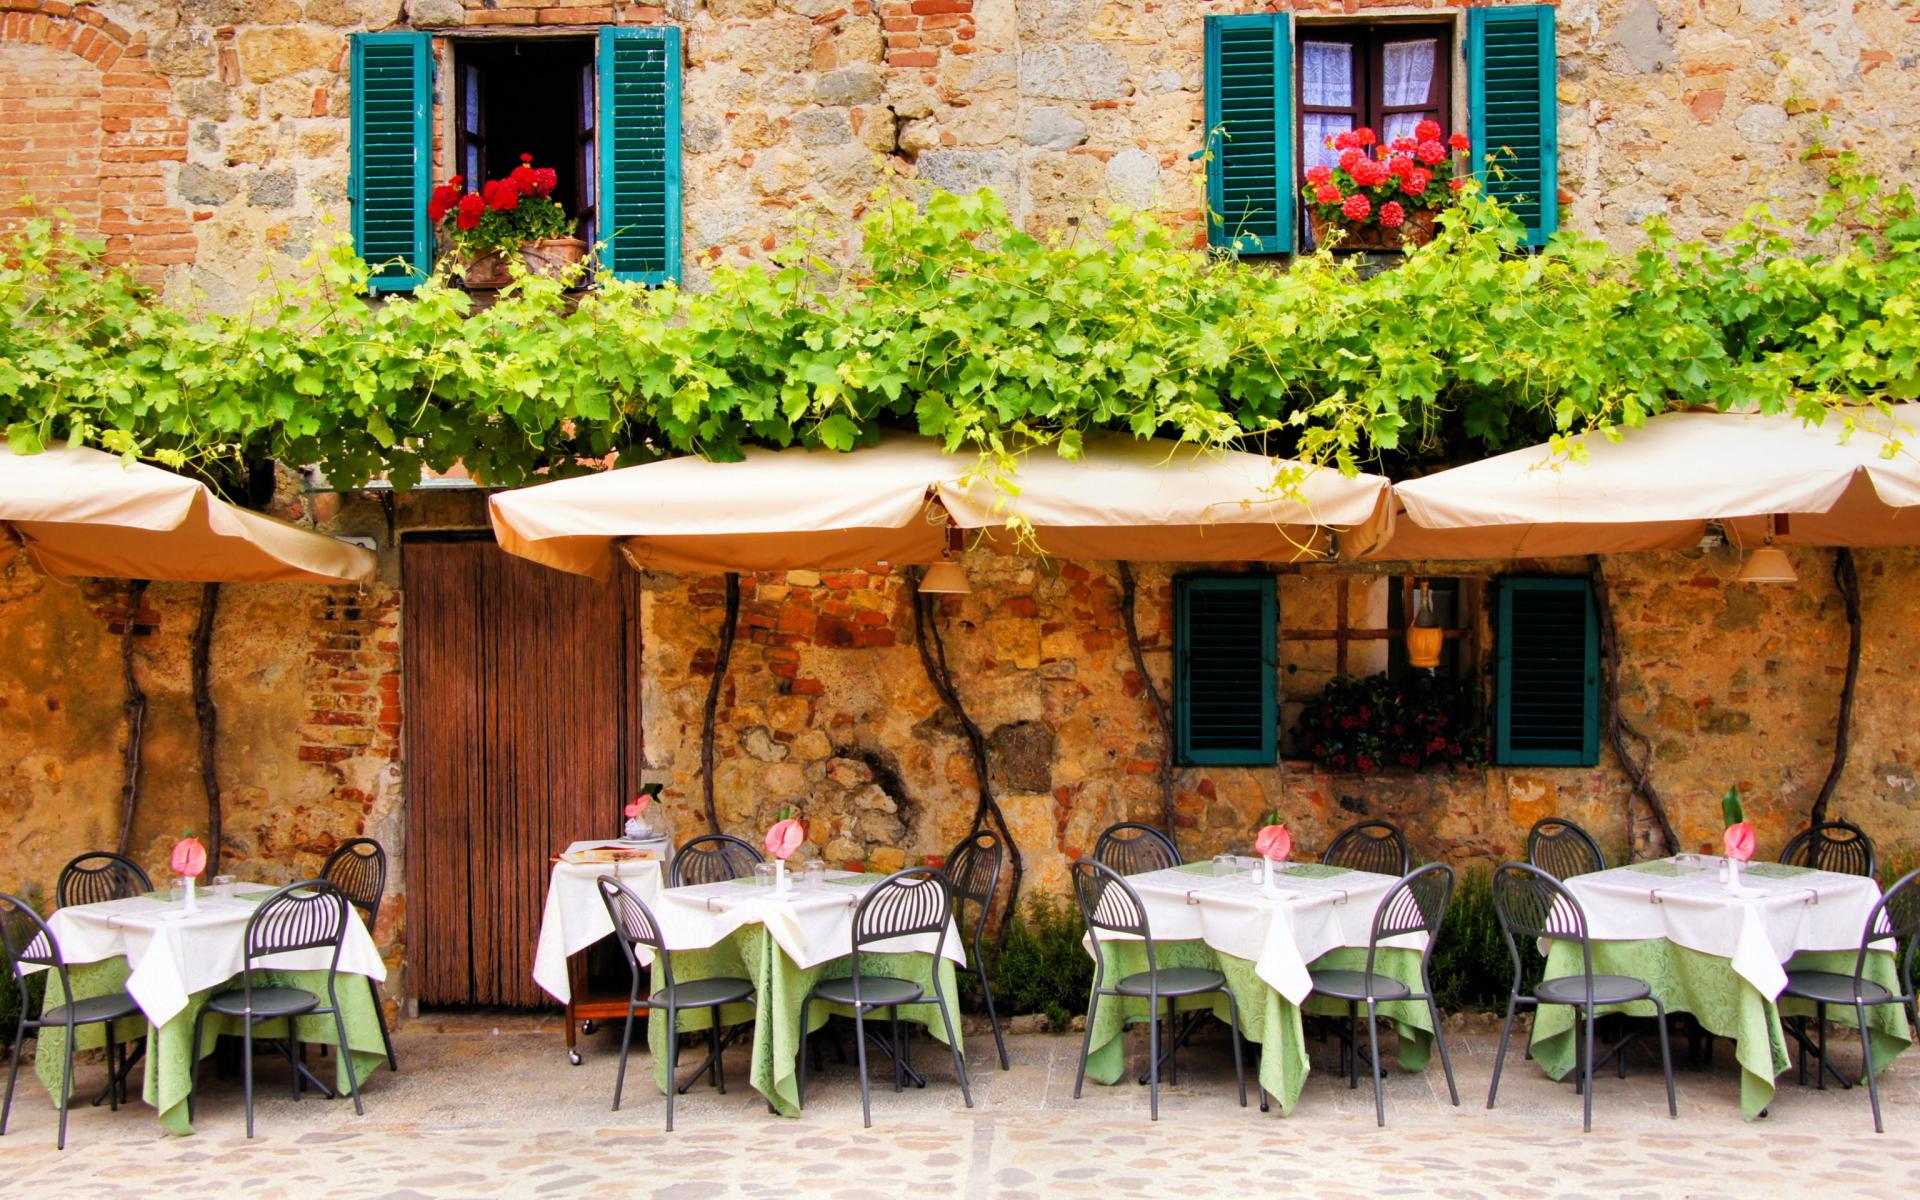 Tavern In Italy para Widescreen Desktop PC 1920x1080 Full HD